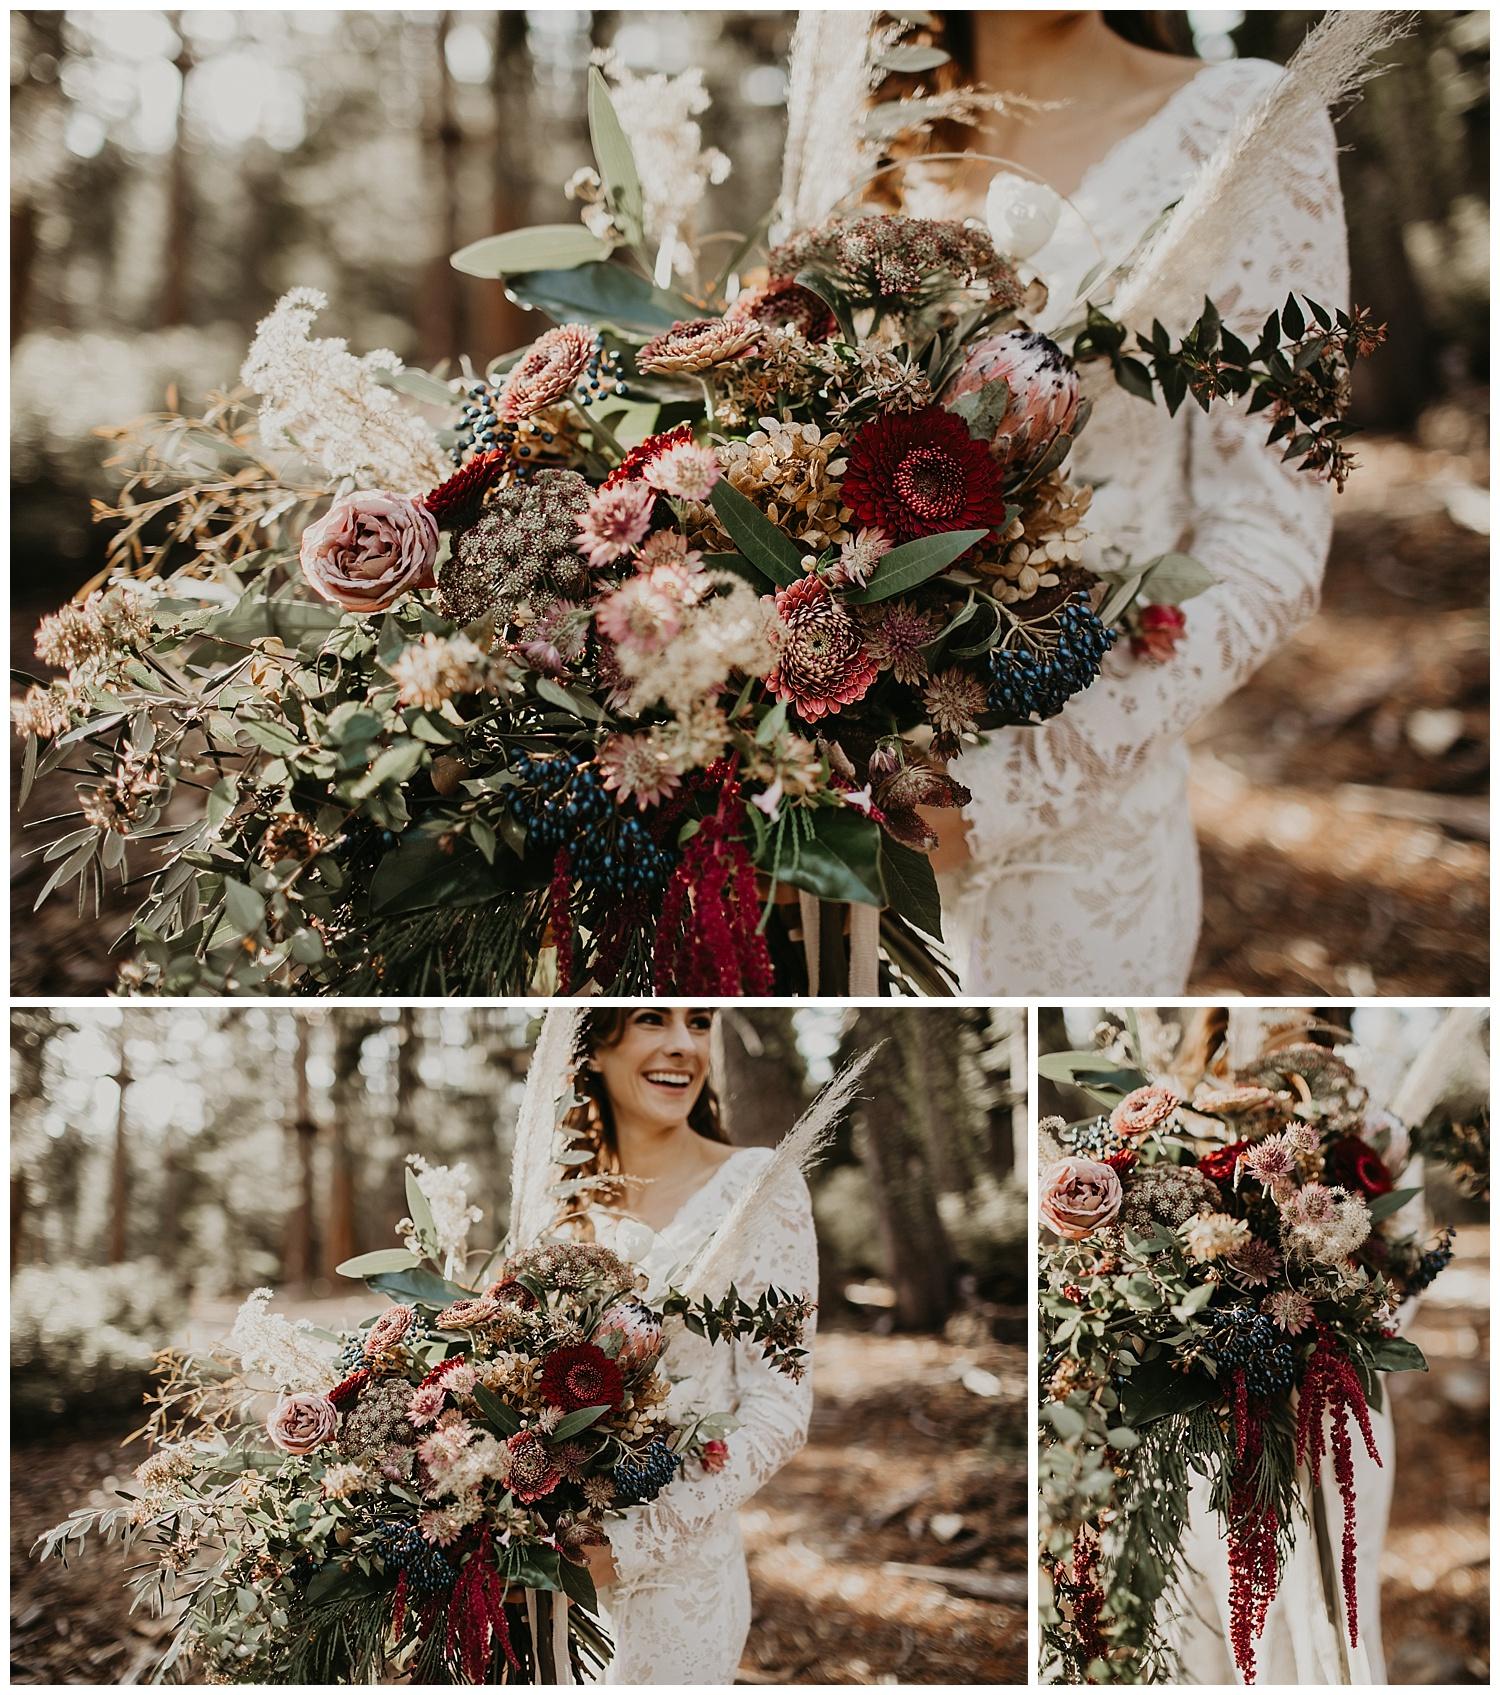 lake-tahoe-winter-wedding-boho-bride-dramatic-bouquet.jpg